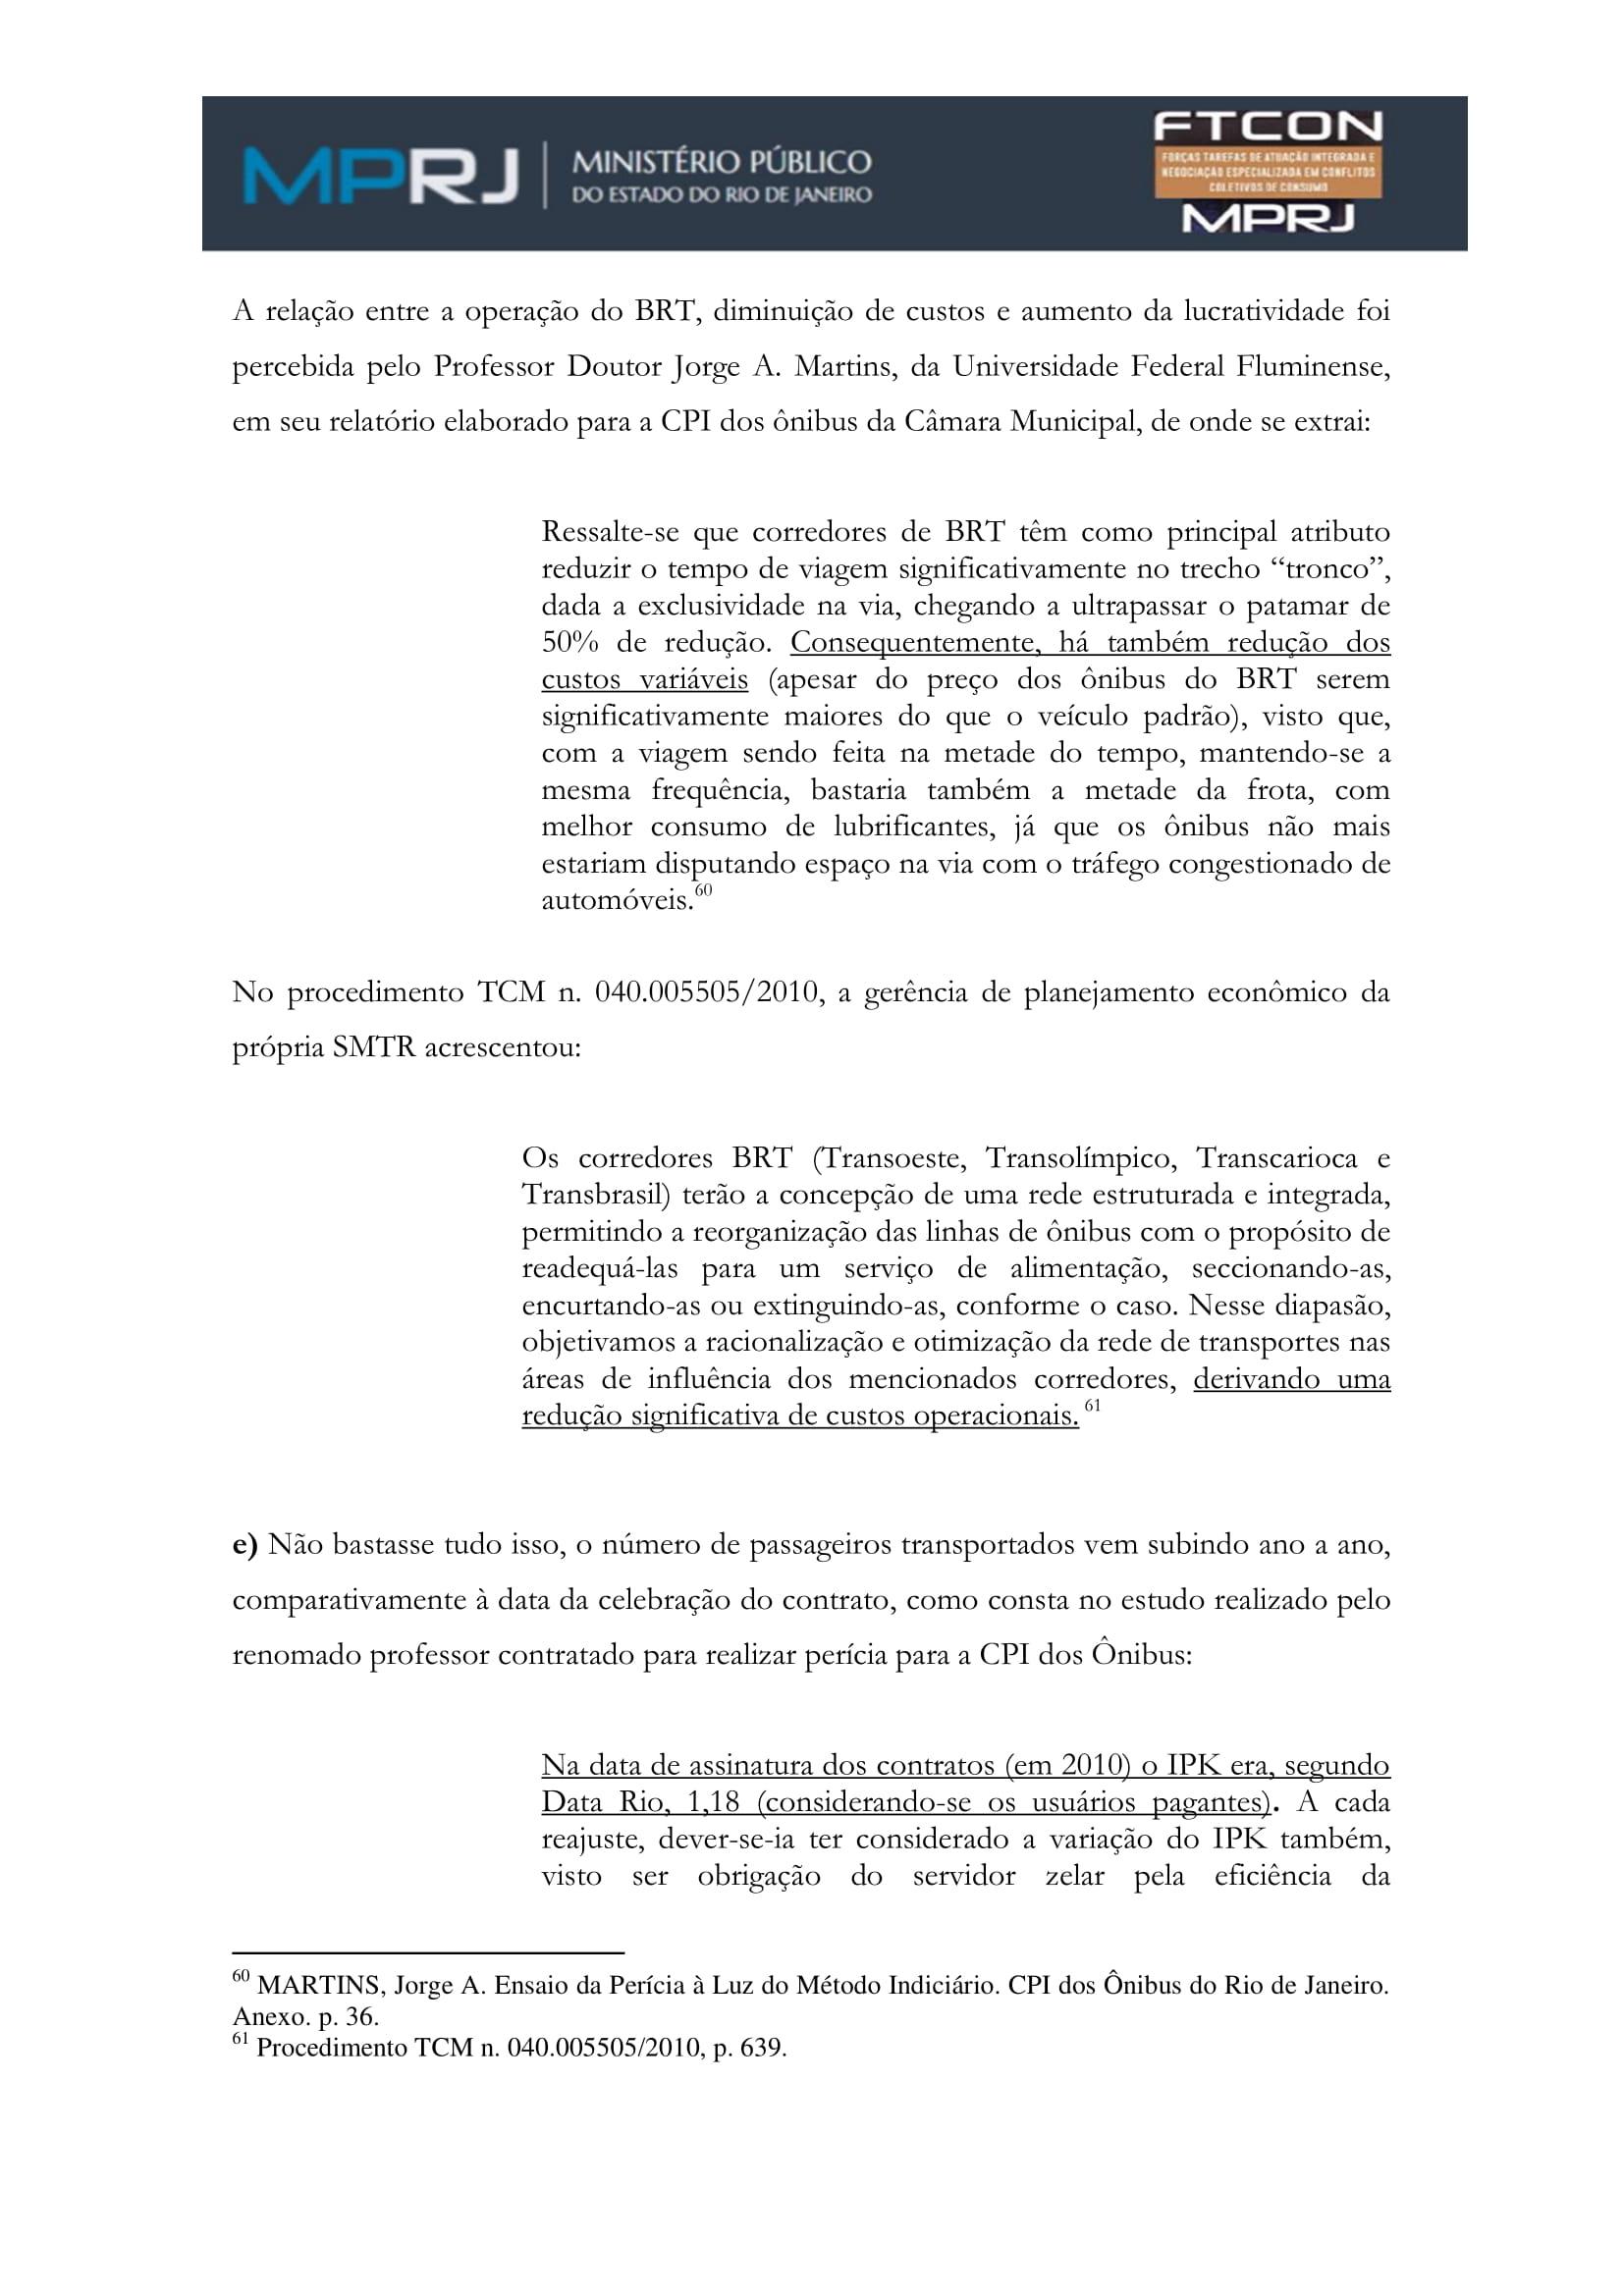 acp_caducidade_onibus_dr_rt-075